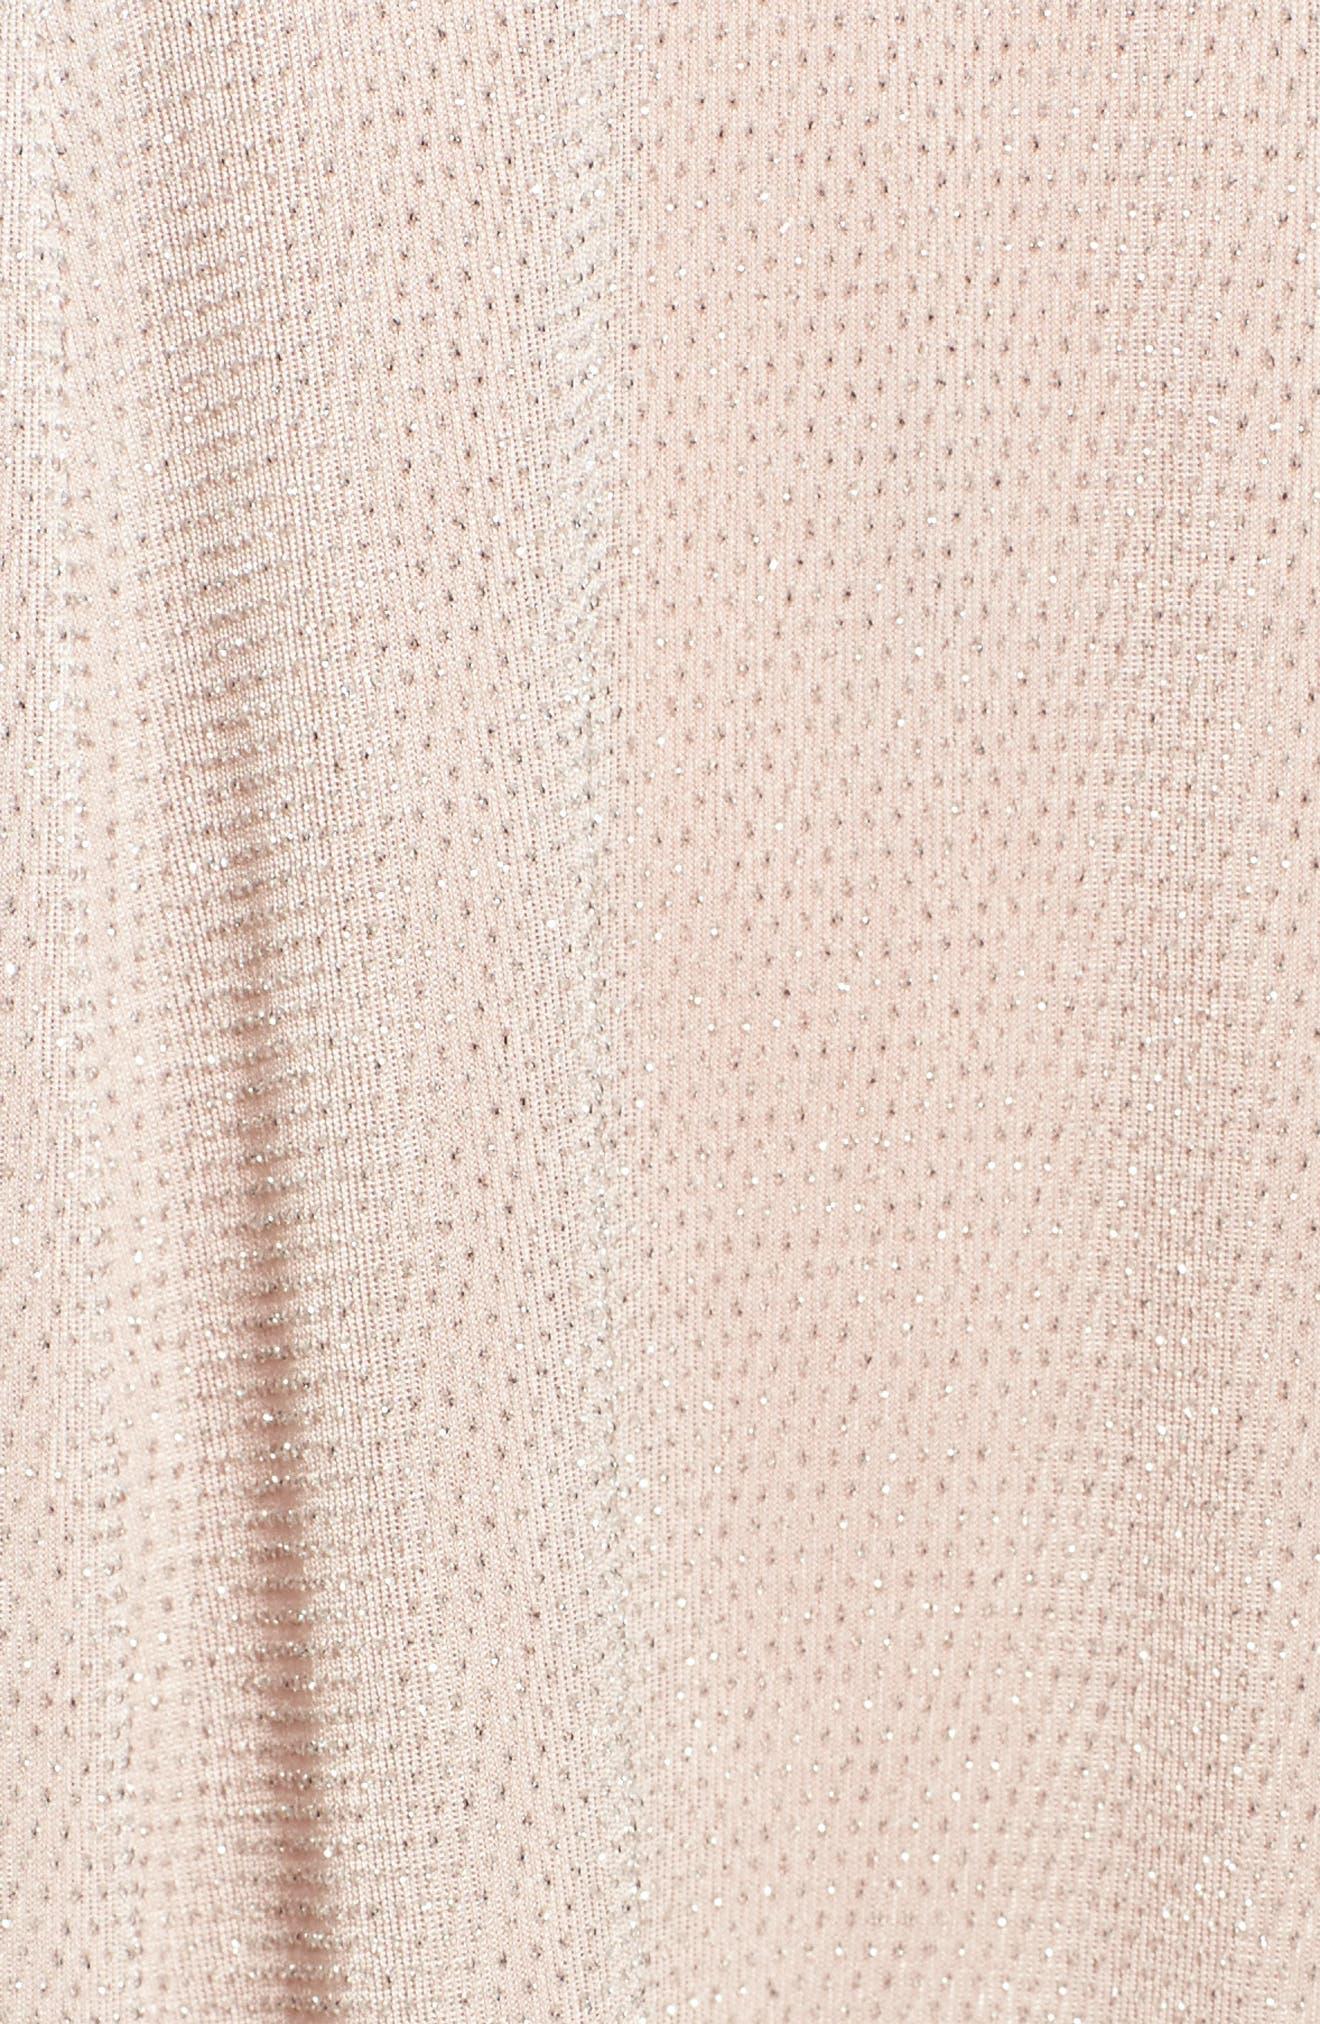 Daphne Ruffle Minidress,                             Alternate thumbnail 5, color,                             650